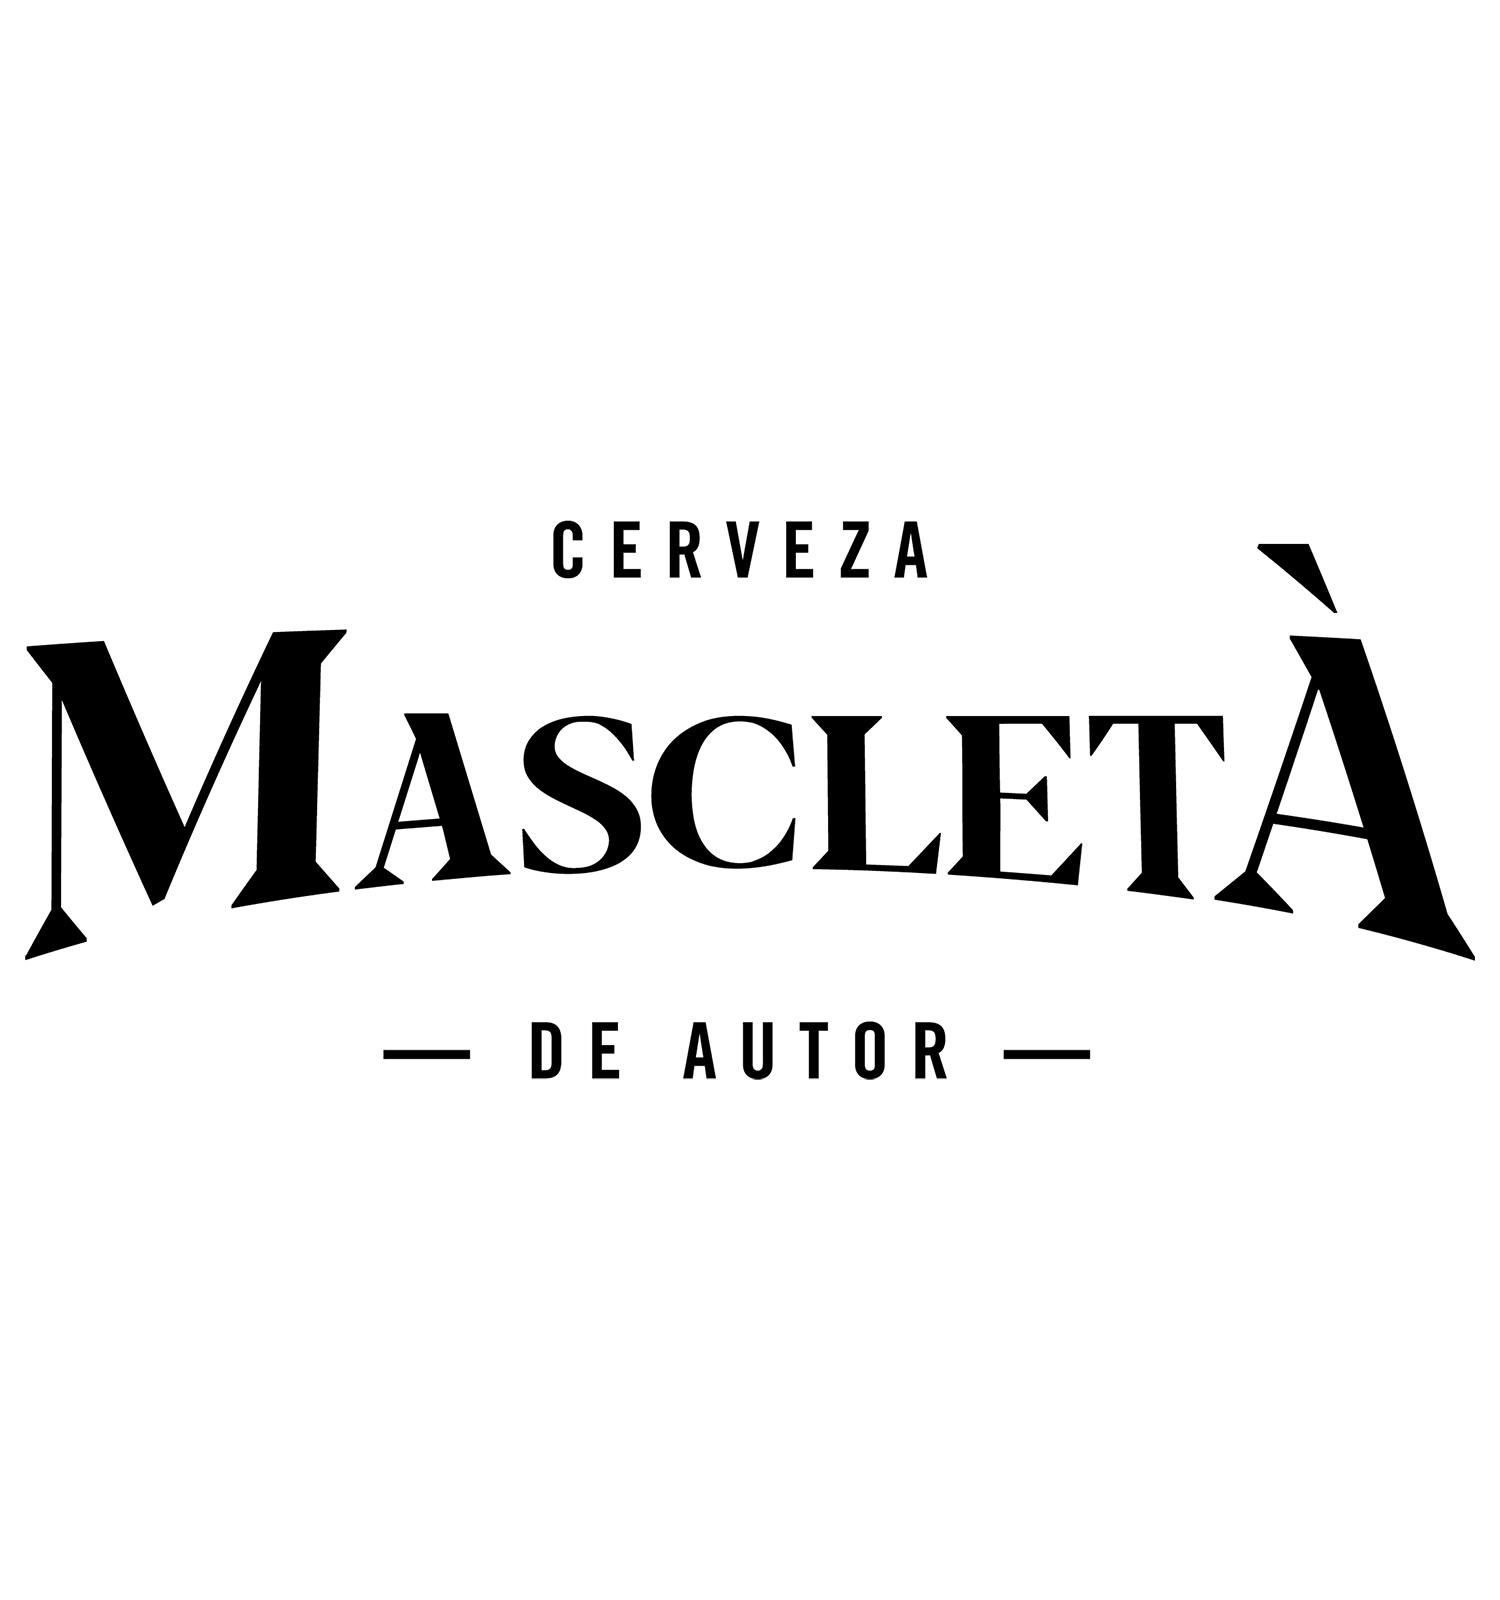 mascleta